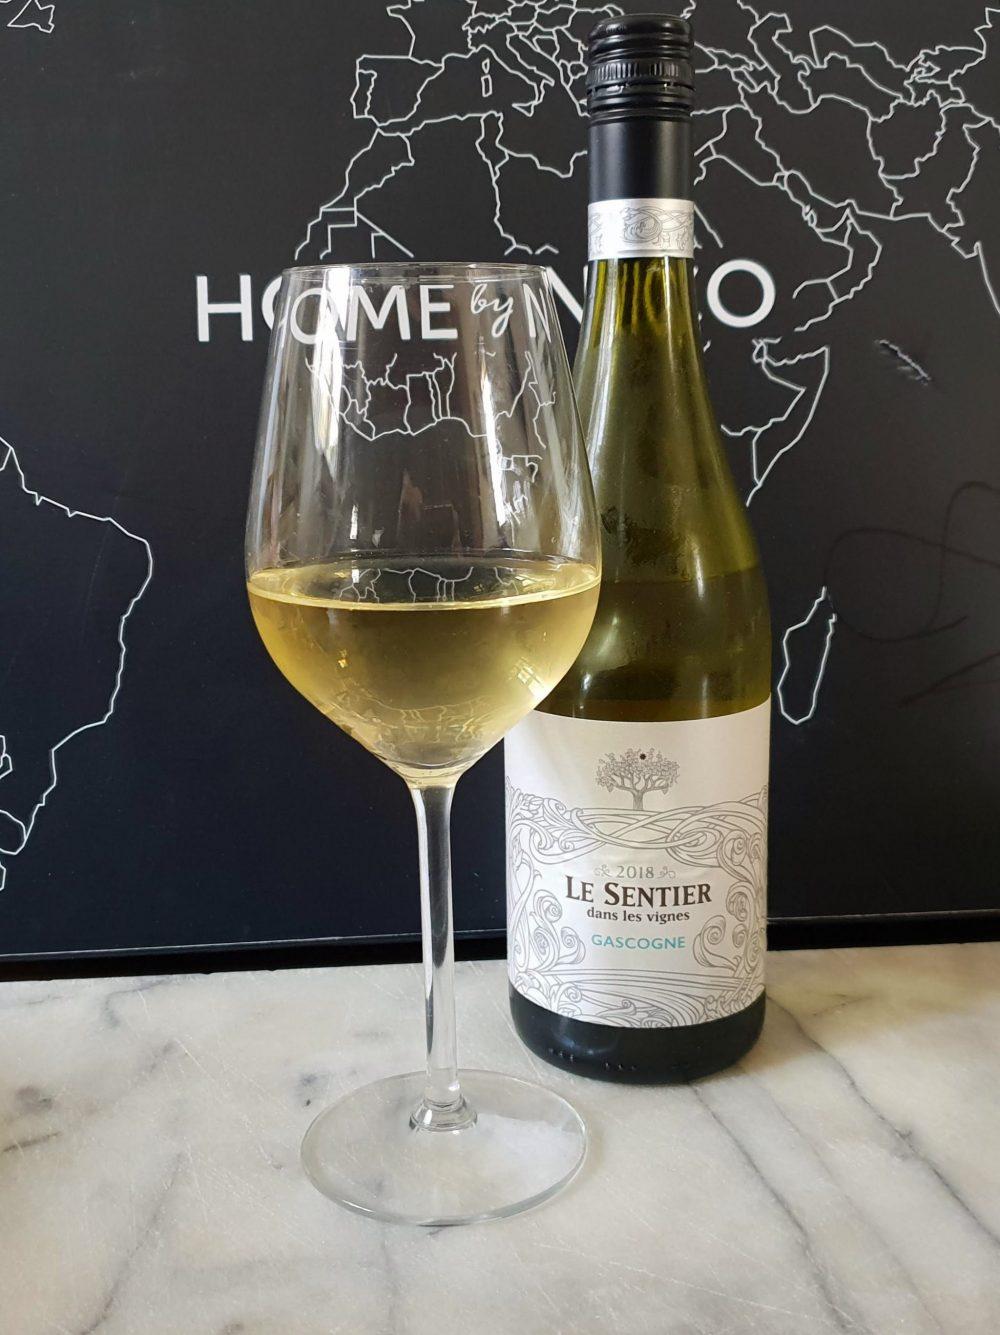 Home By Nico wine pairing